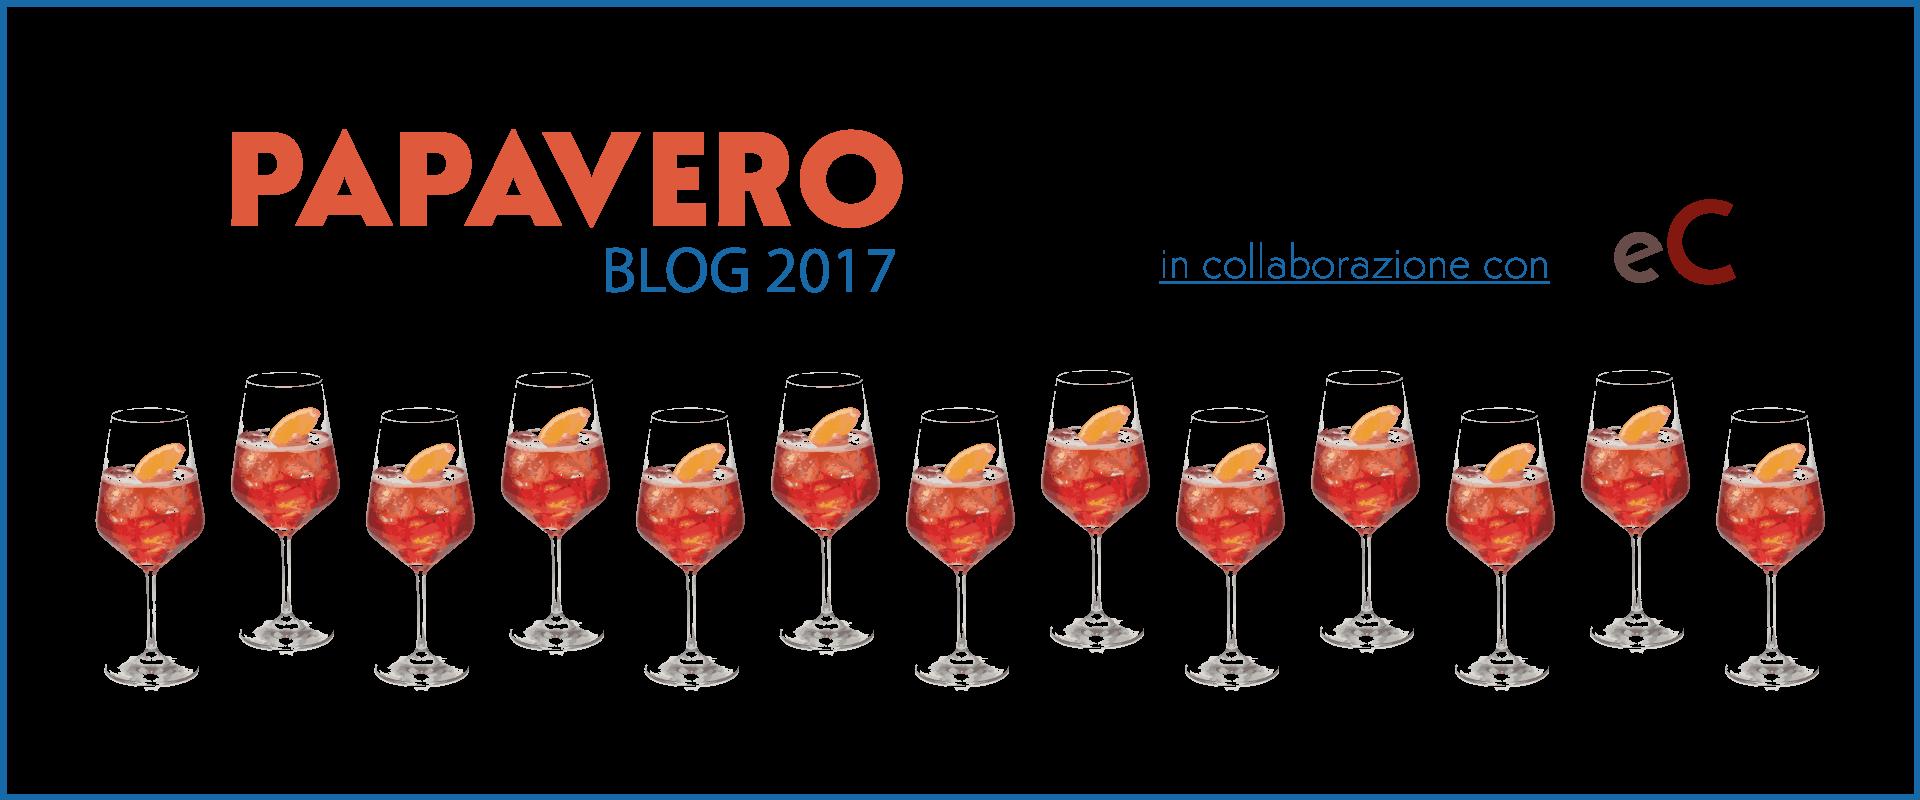 du30-blog2017-headerok-960x400x2